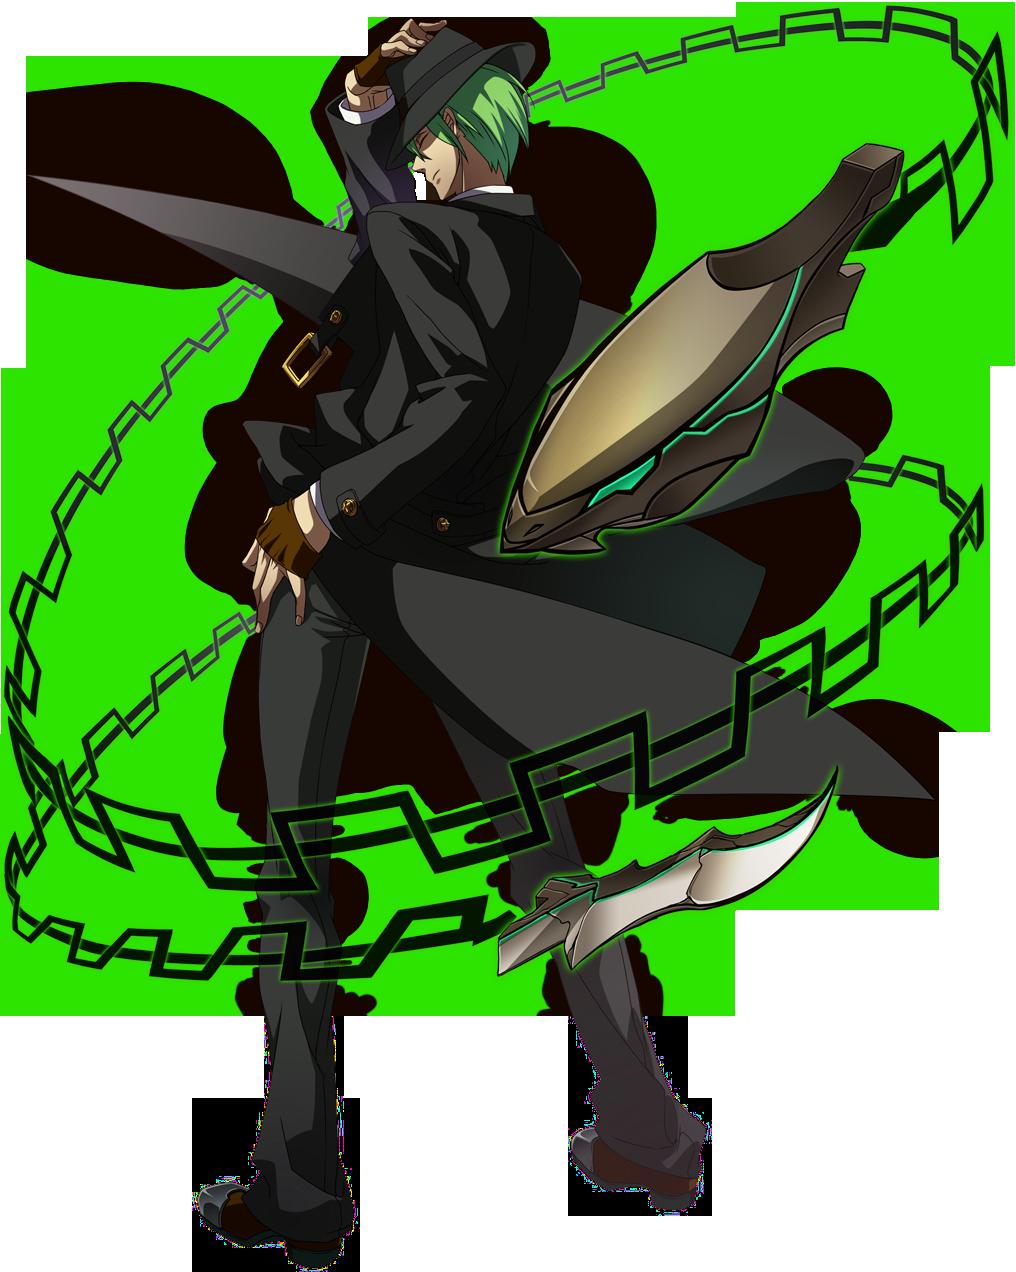 Hazama. lol. Hazama_%28Story_Mode_Artwork%2C_Pre_Battle%29